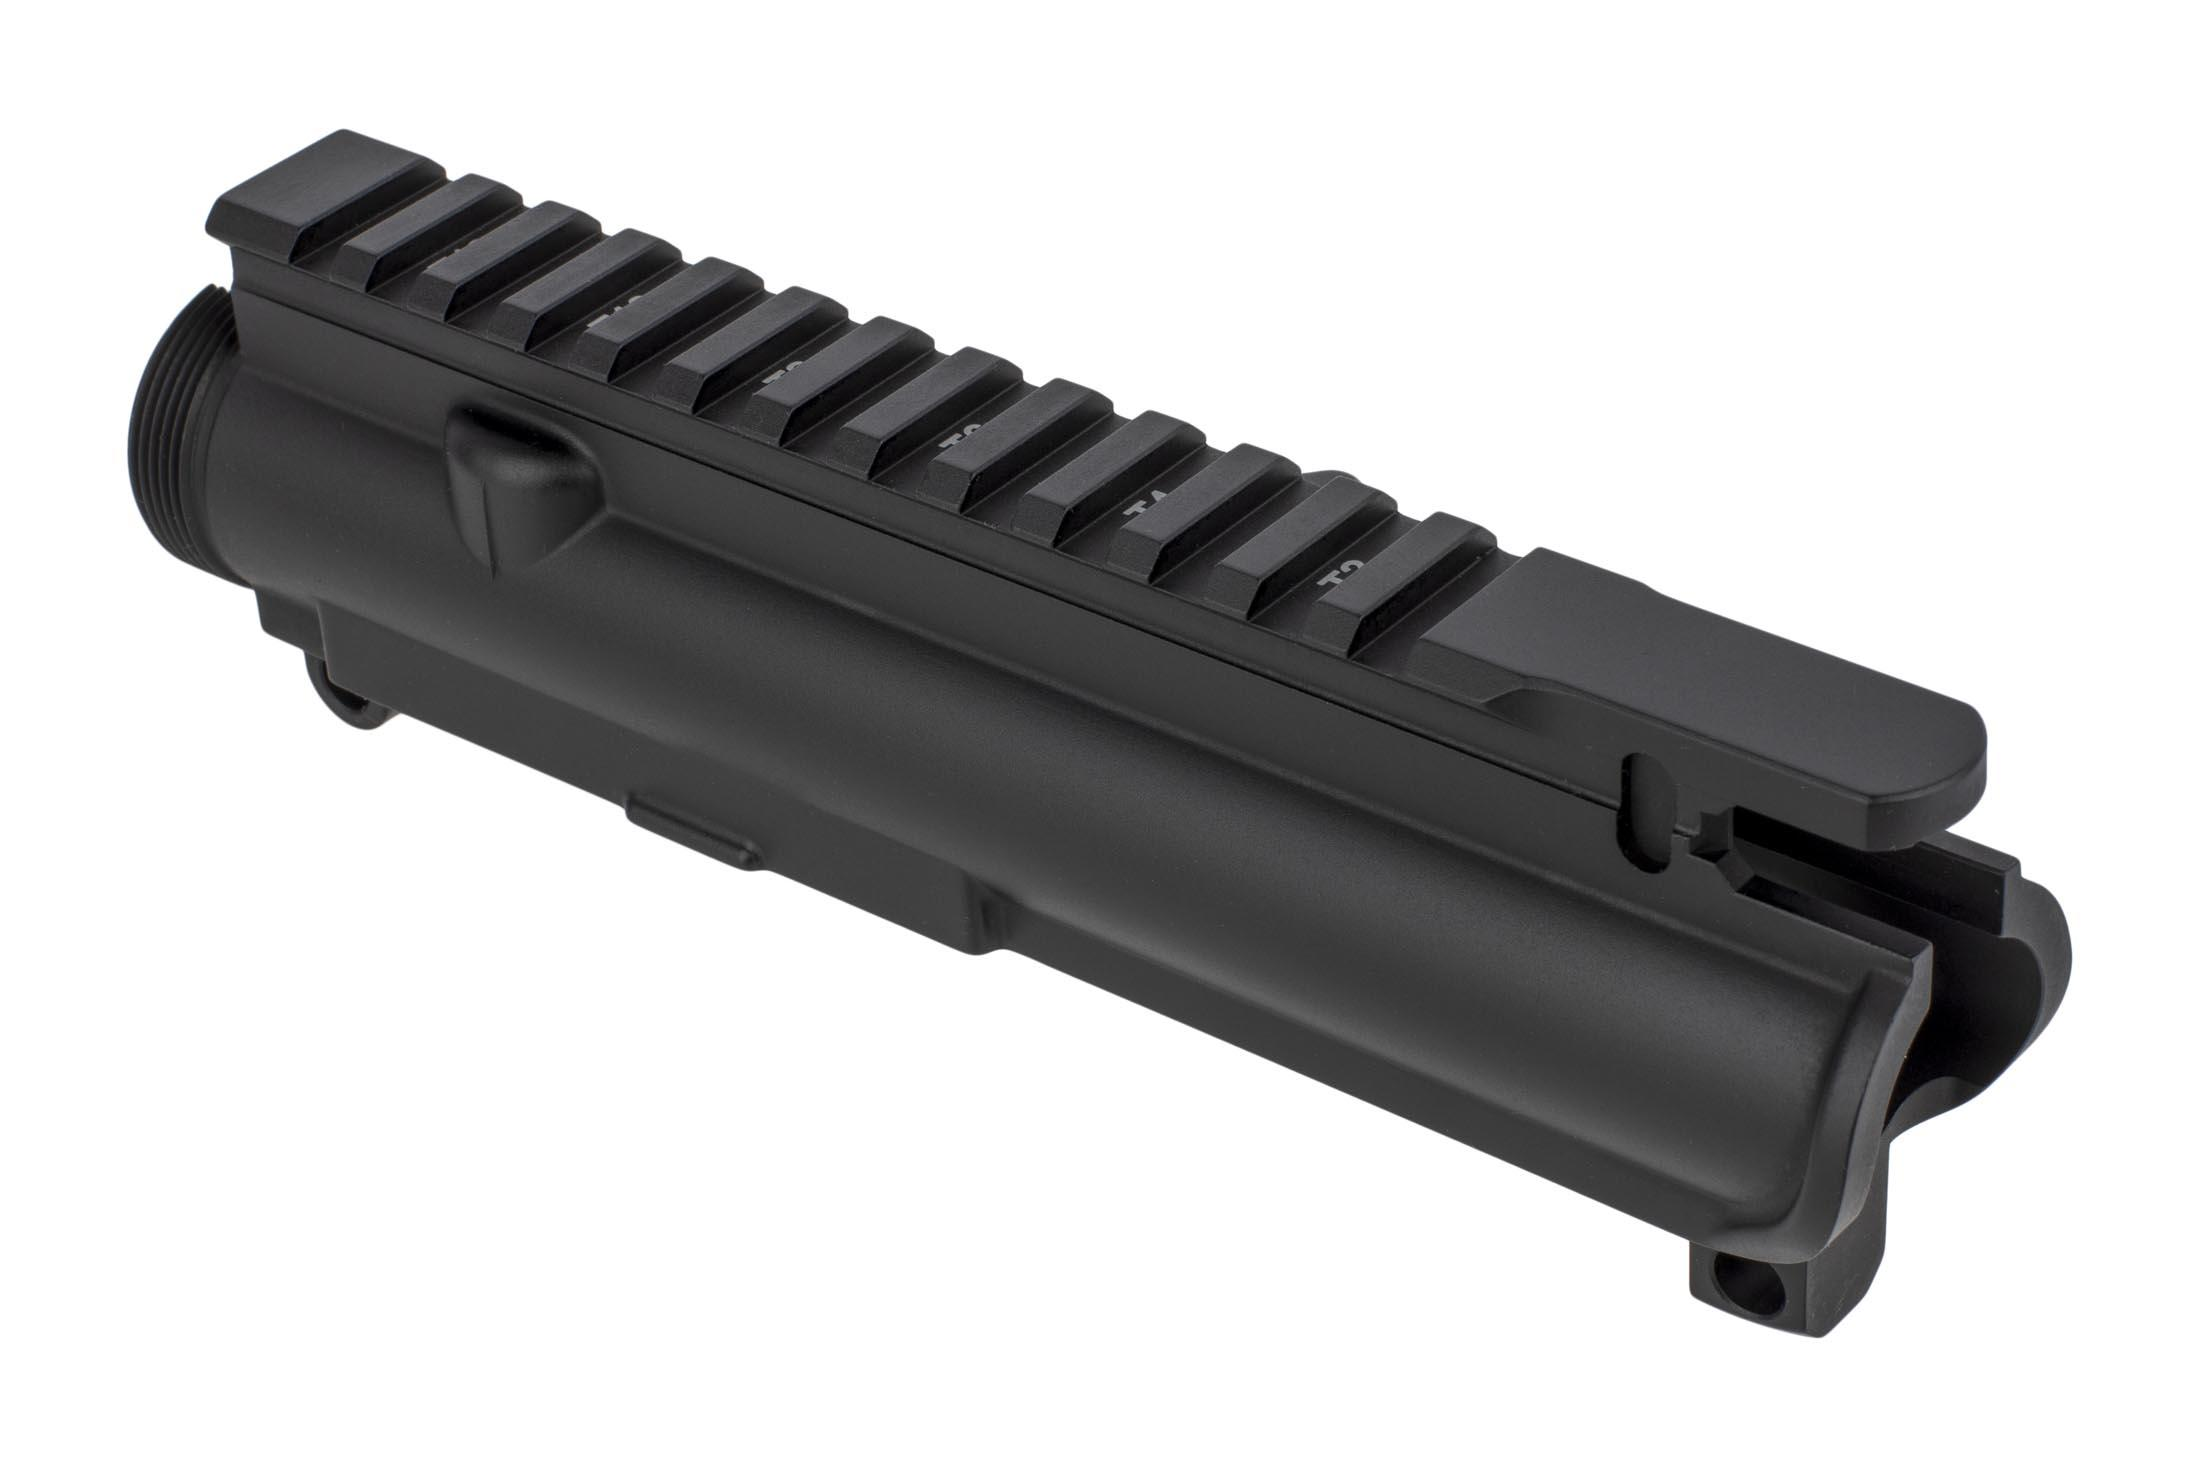 Aero Precision Stripped AR-15 Upper Receiver - Slick Side - Black